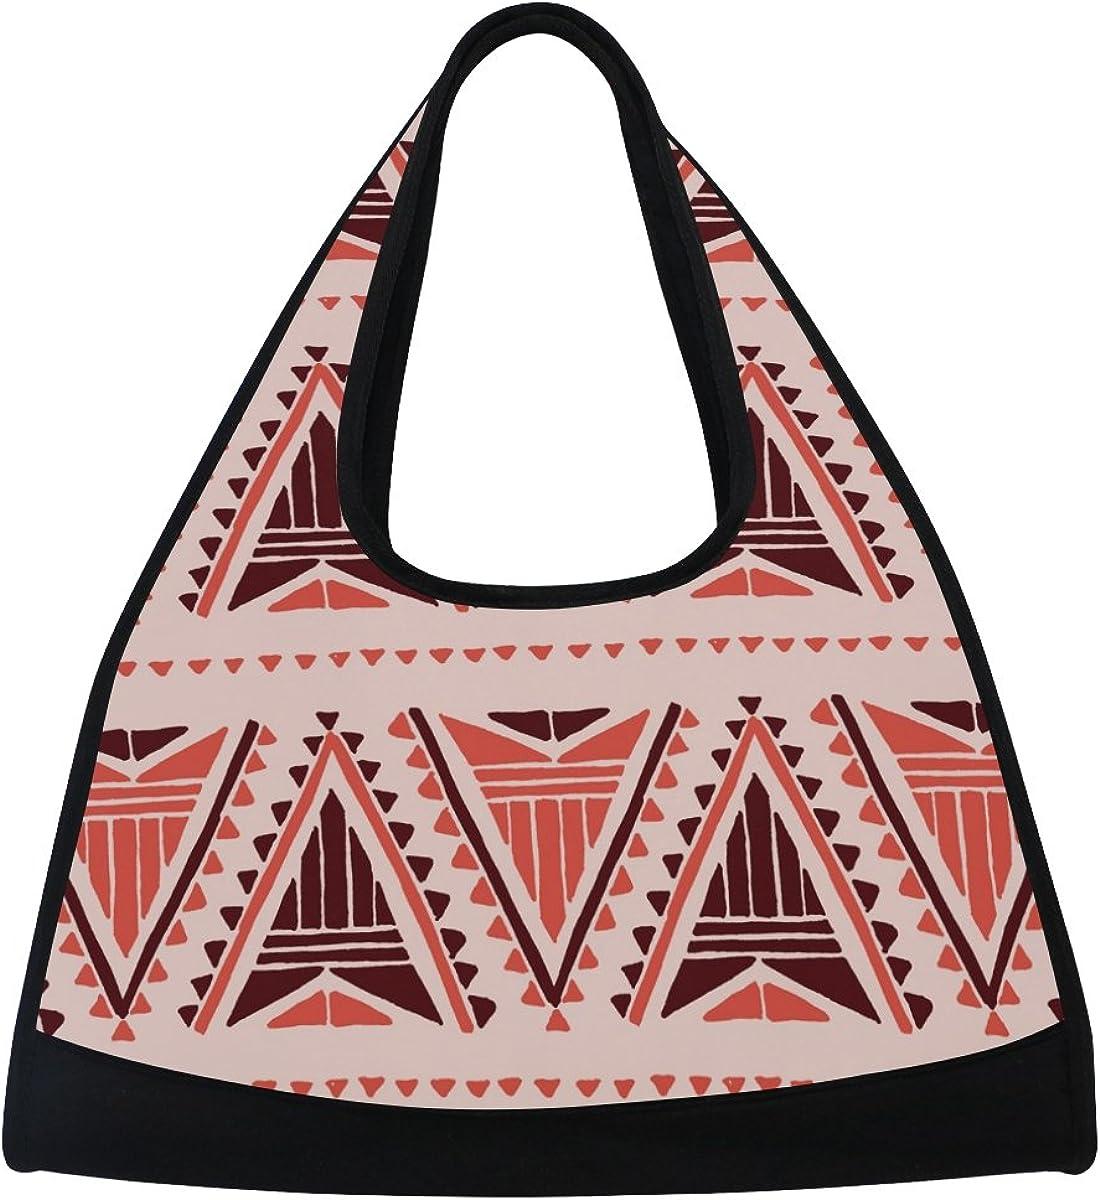 AHOMY Canvas Sports Gym Bag Retro Indian Tribes Travel Shoulder Bag